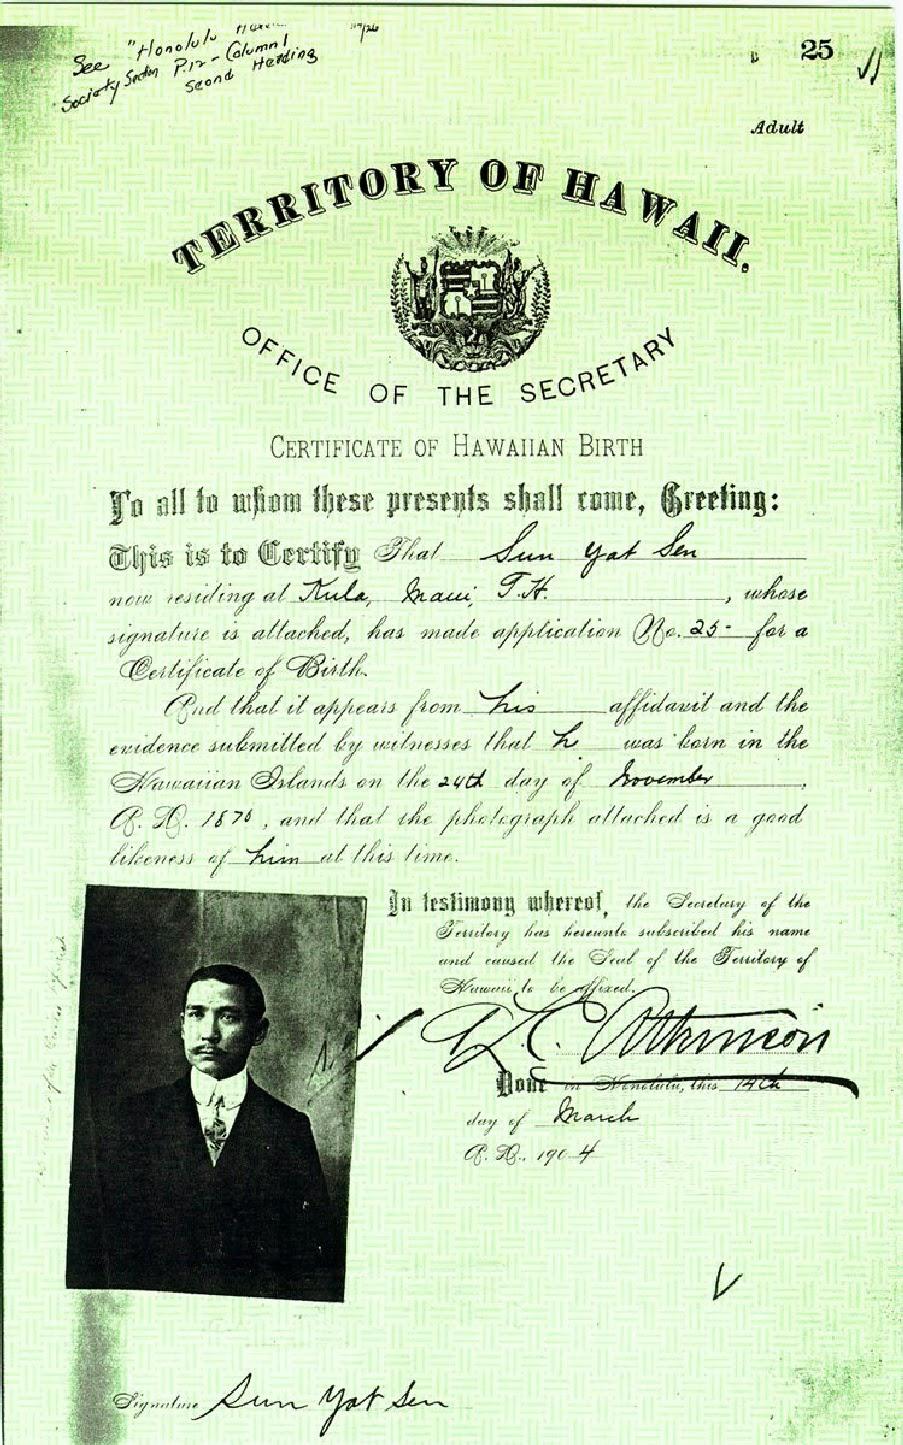 Hookuleana november 2014 certificate of hawaiian birth 1betcityfo Image collections